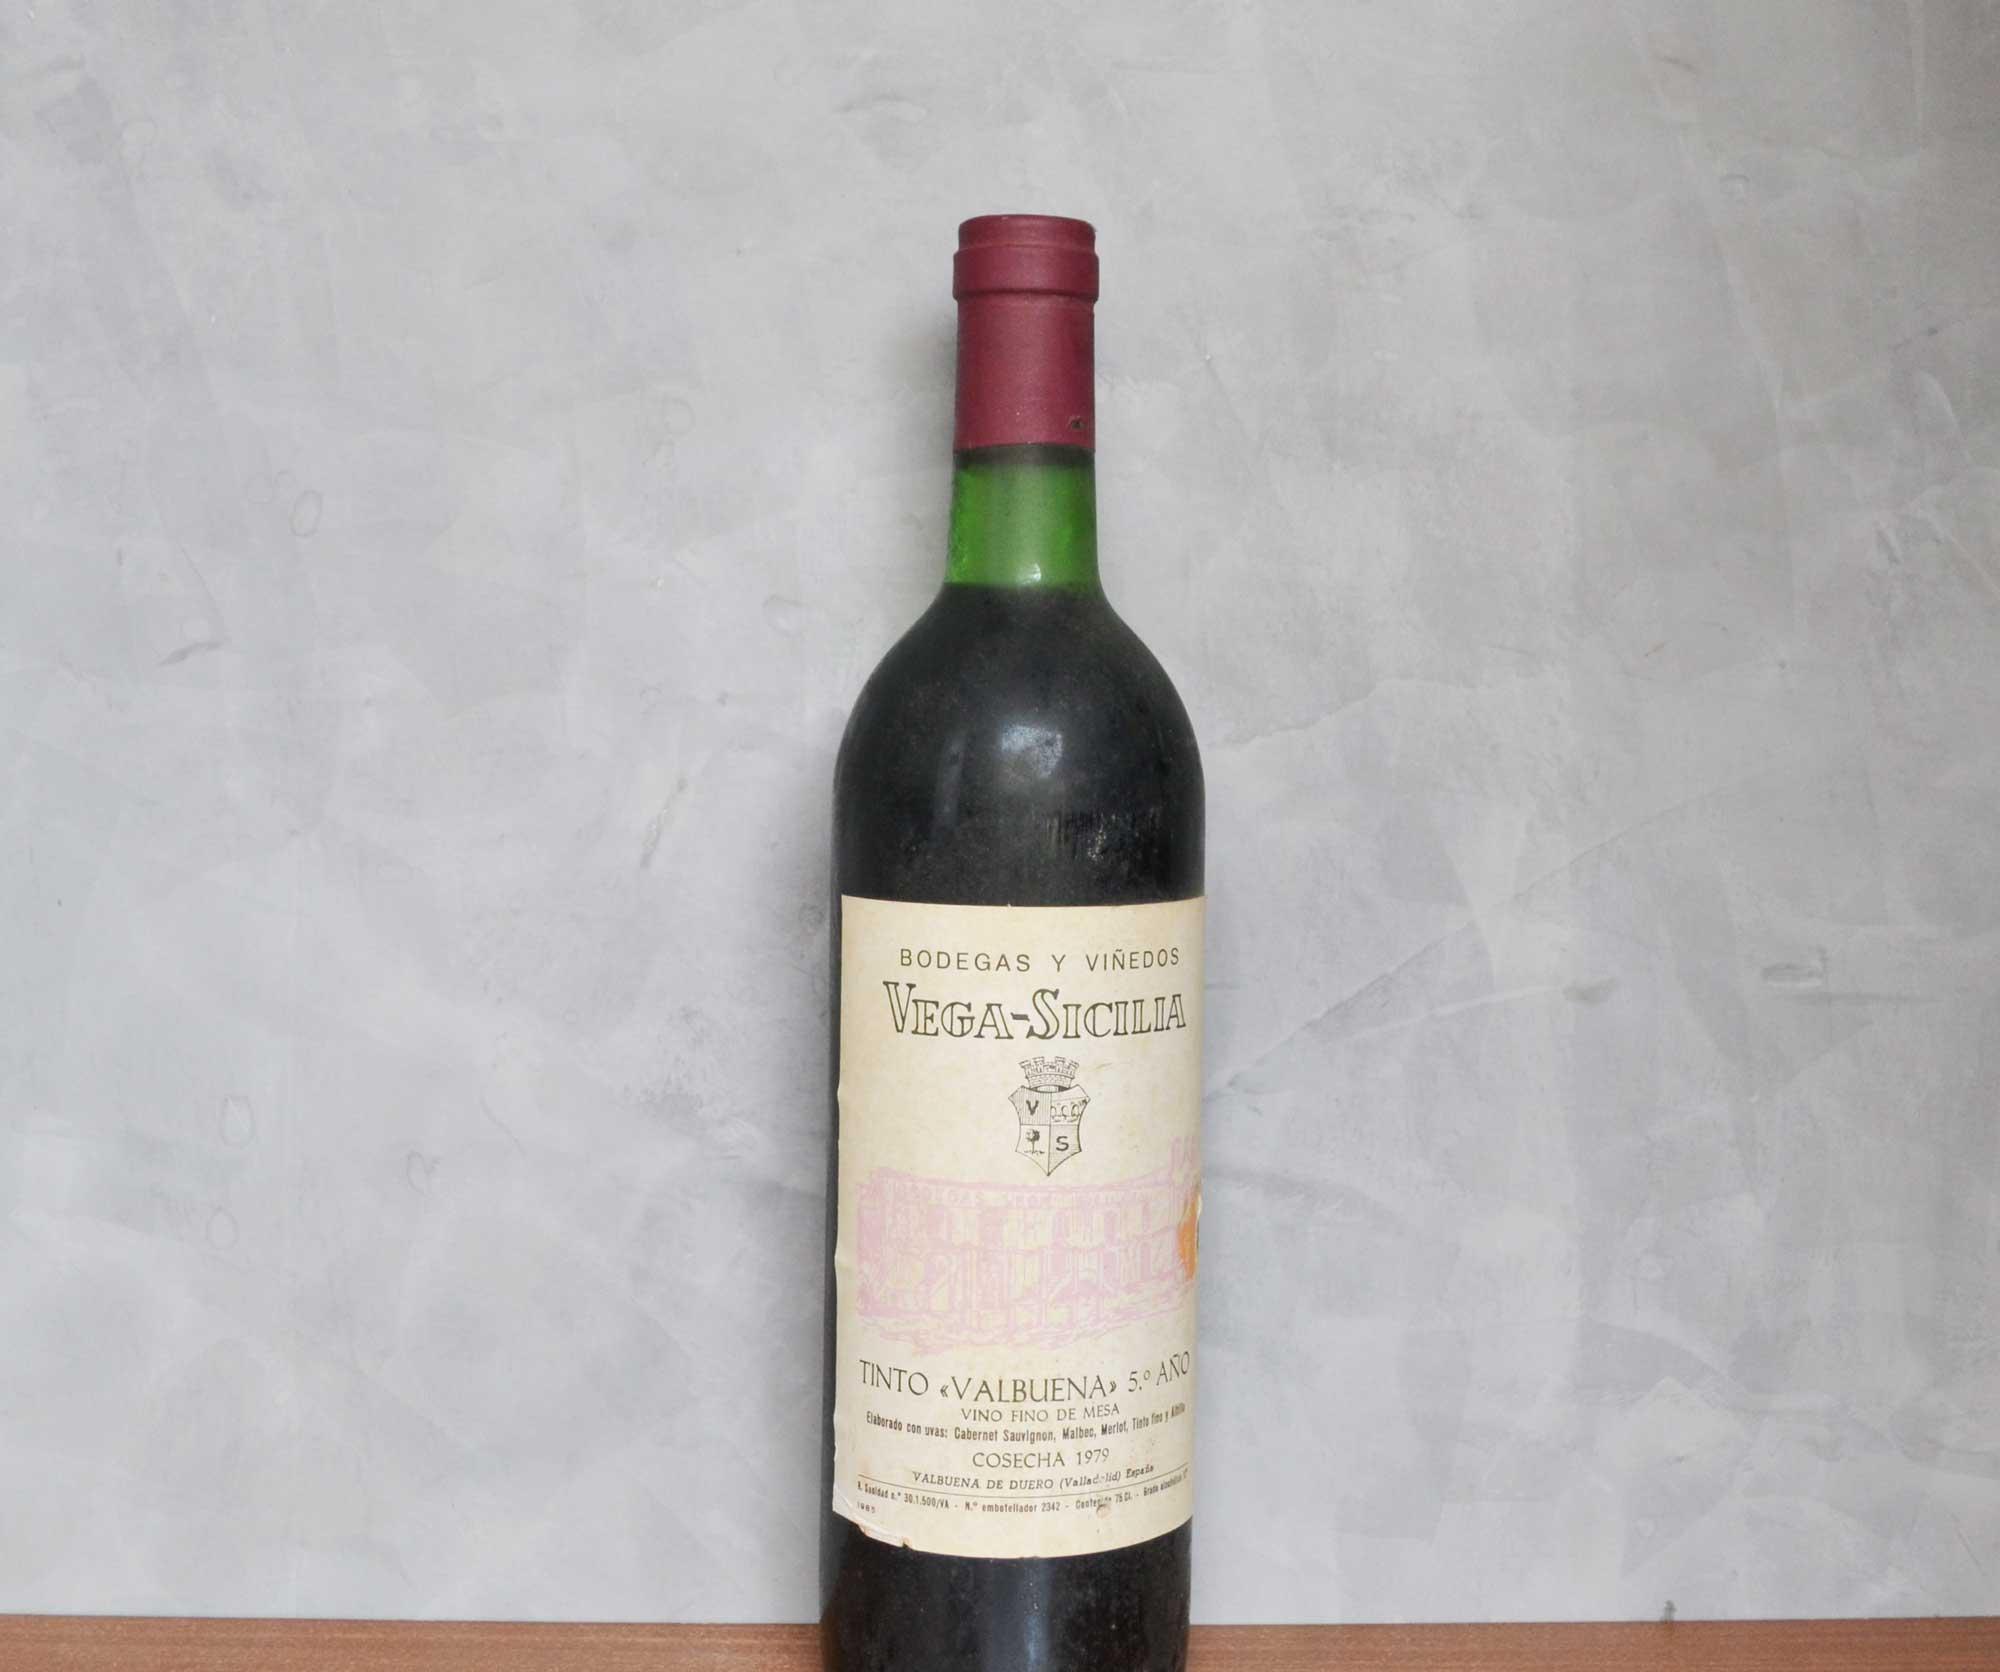 Vega Sicilia Valbuena 5 año 1979